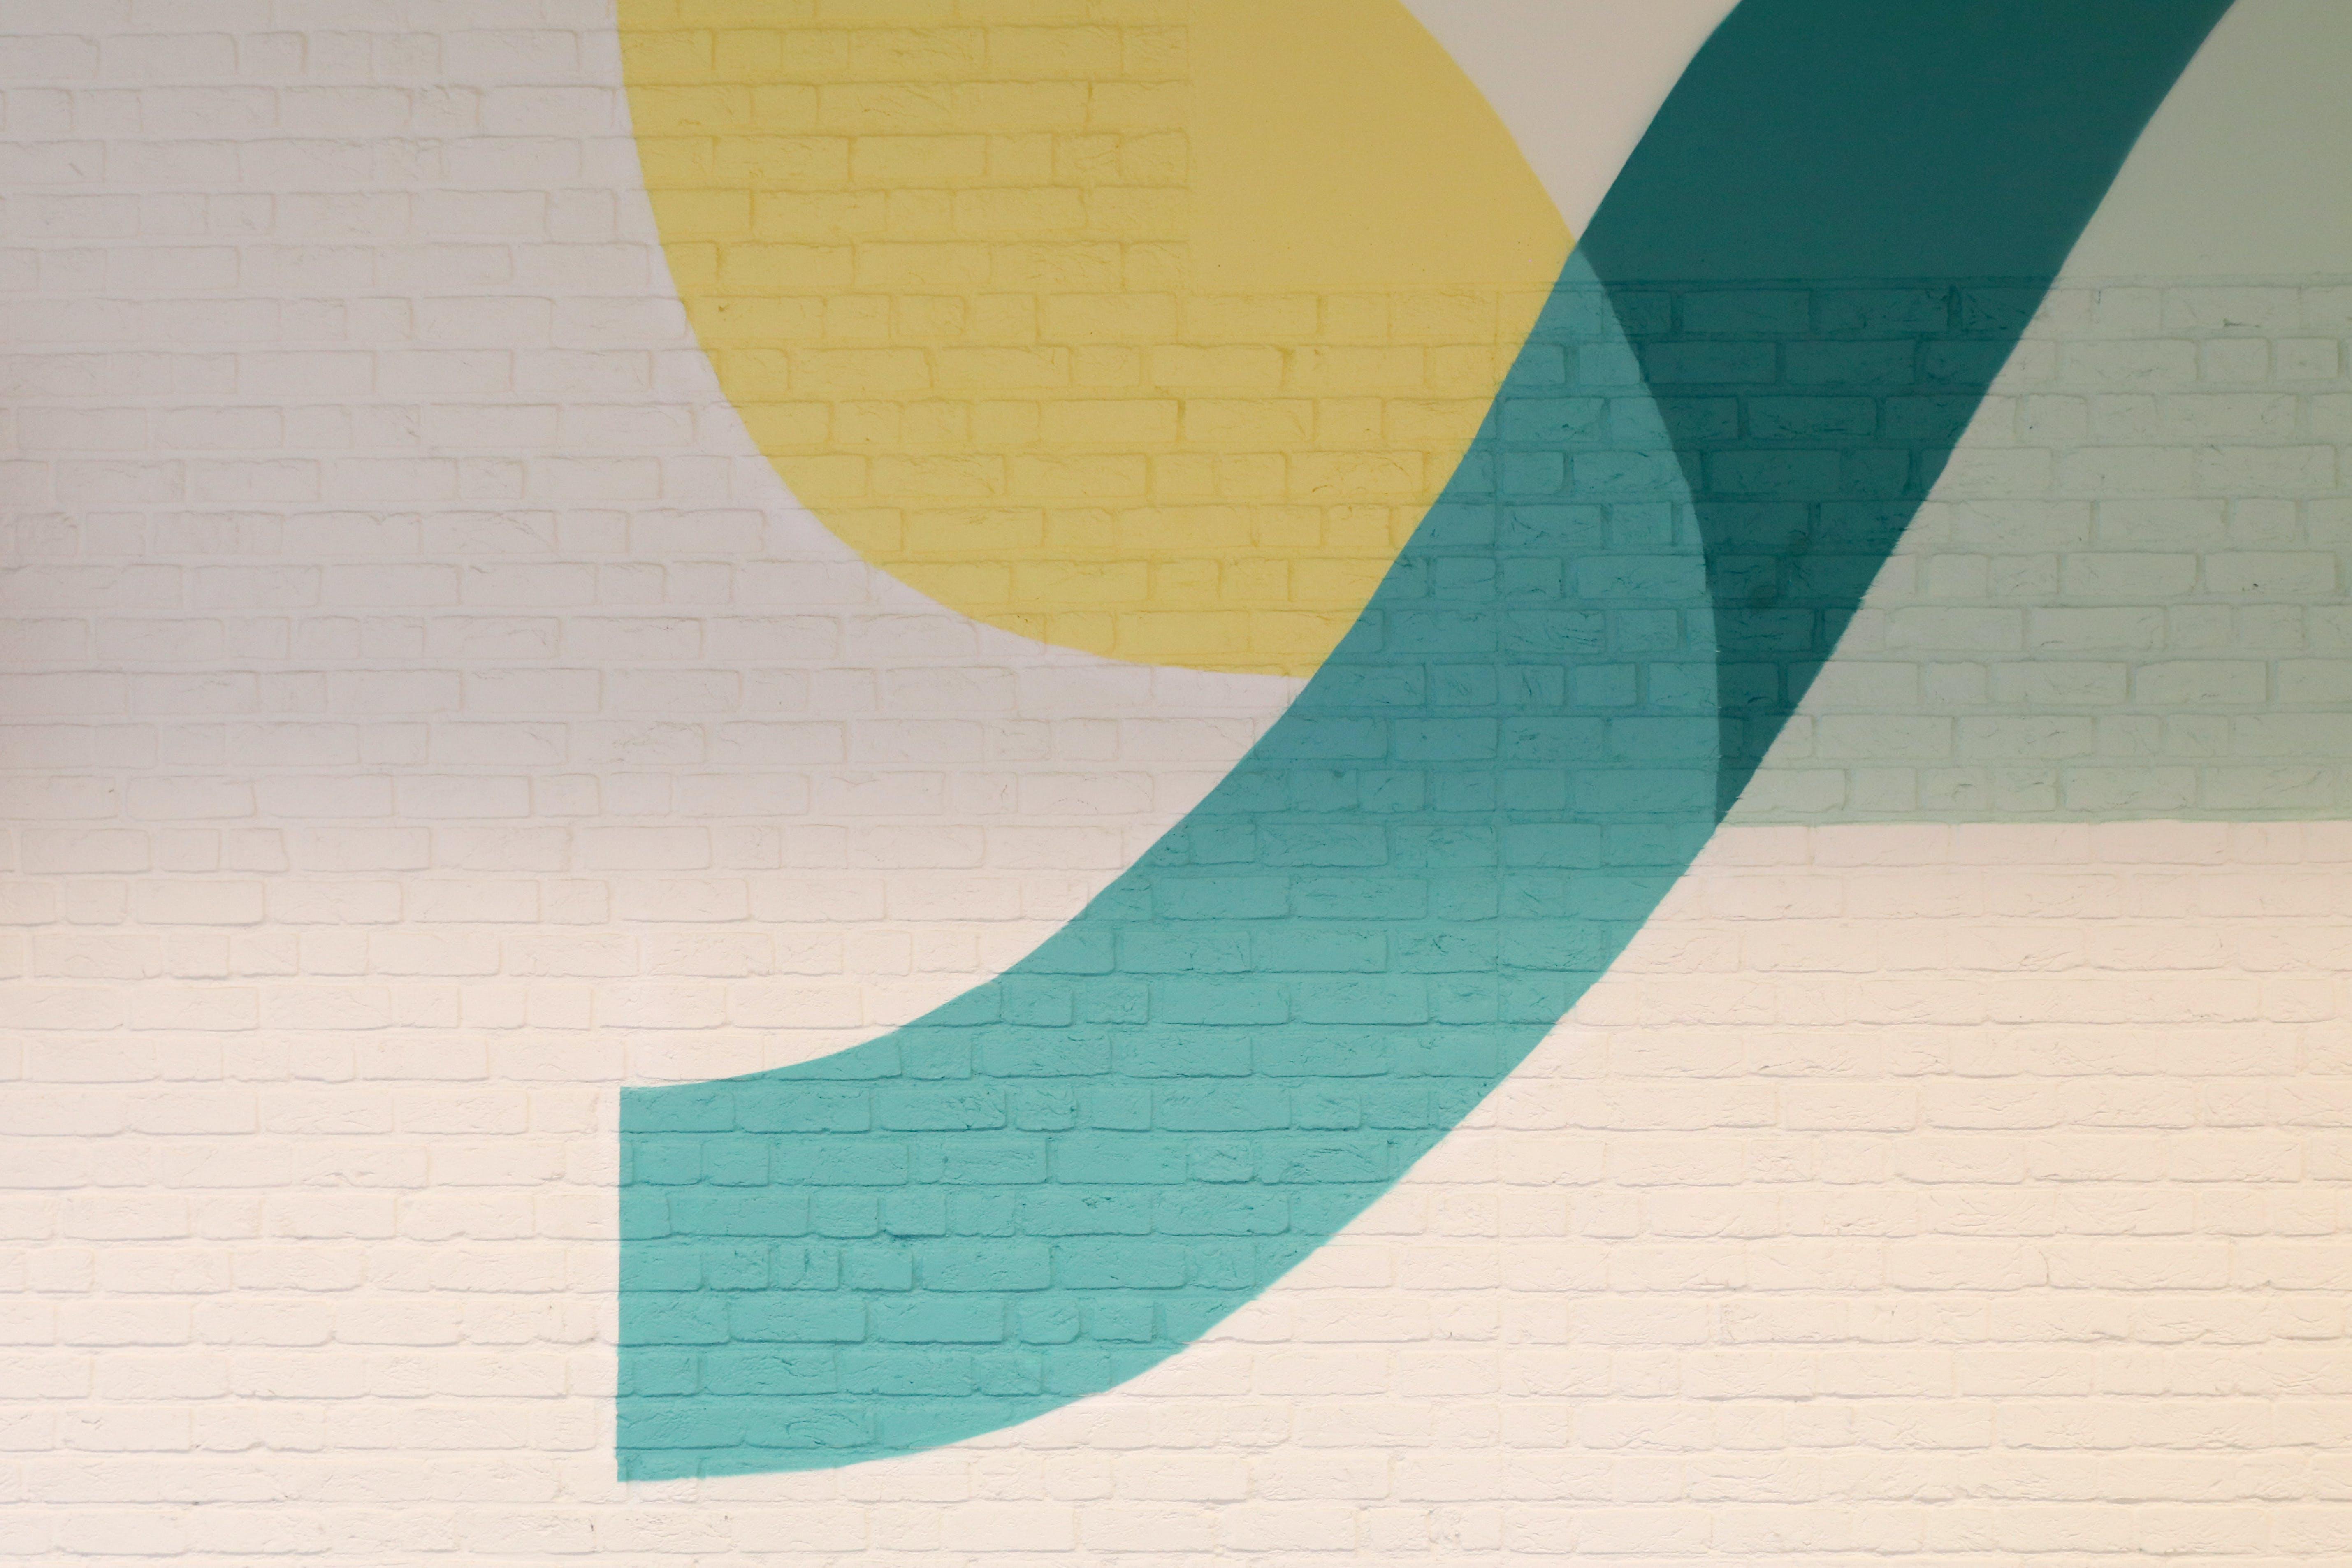 Kostenloses Stock Foto zu abstrakt, backsteinmauer, bemalte wand, cyan